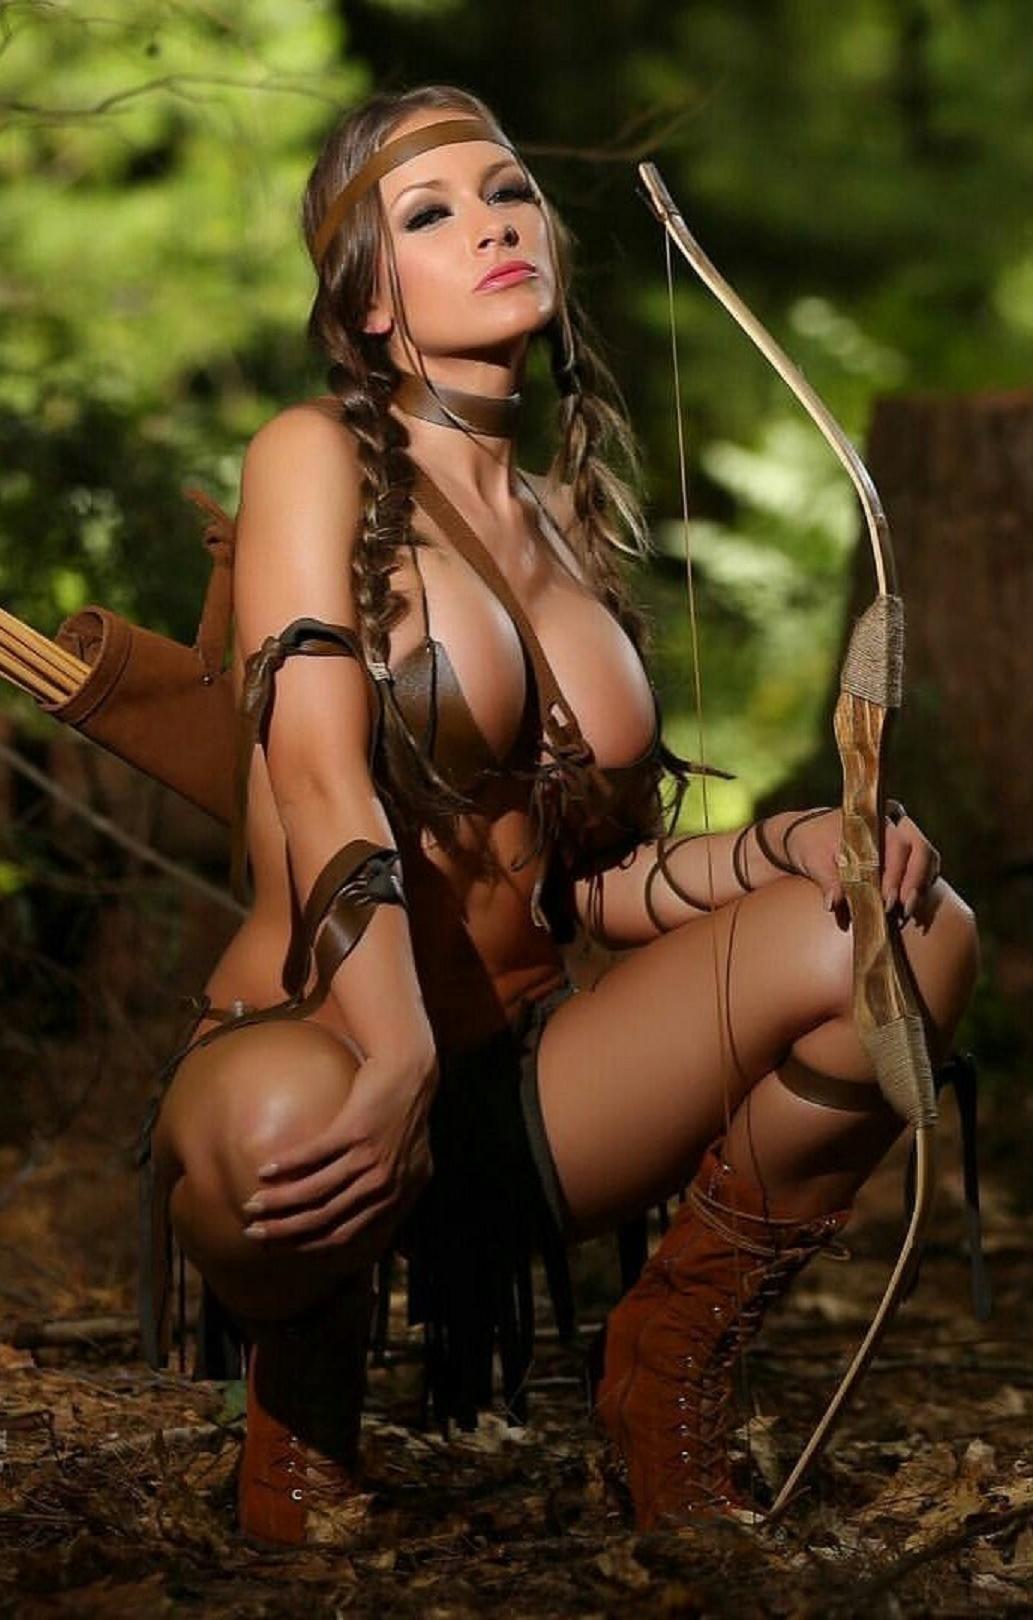 эротика девушки воины арт фото - 9